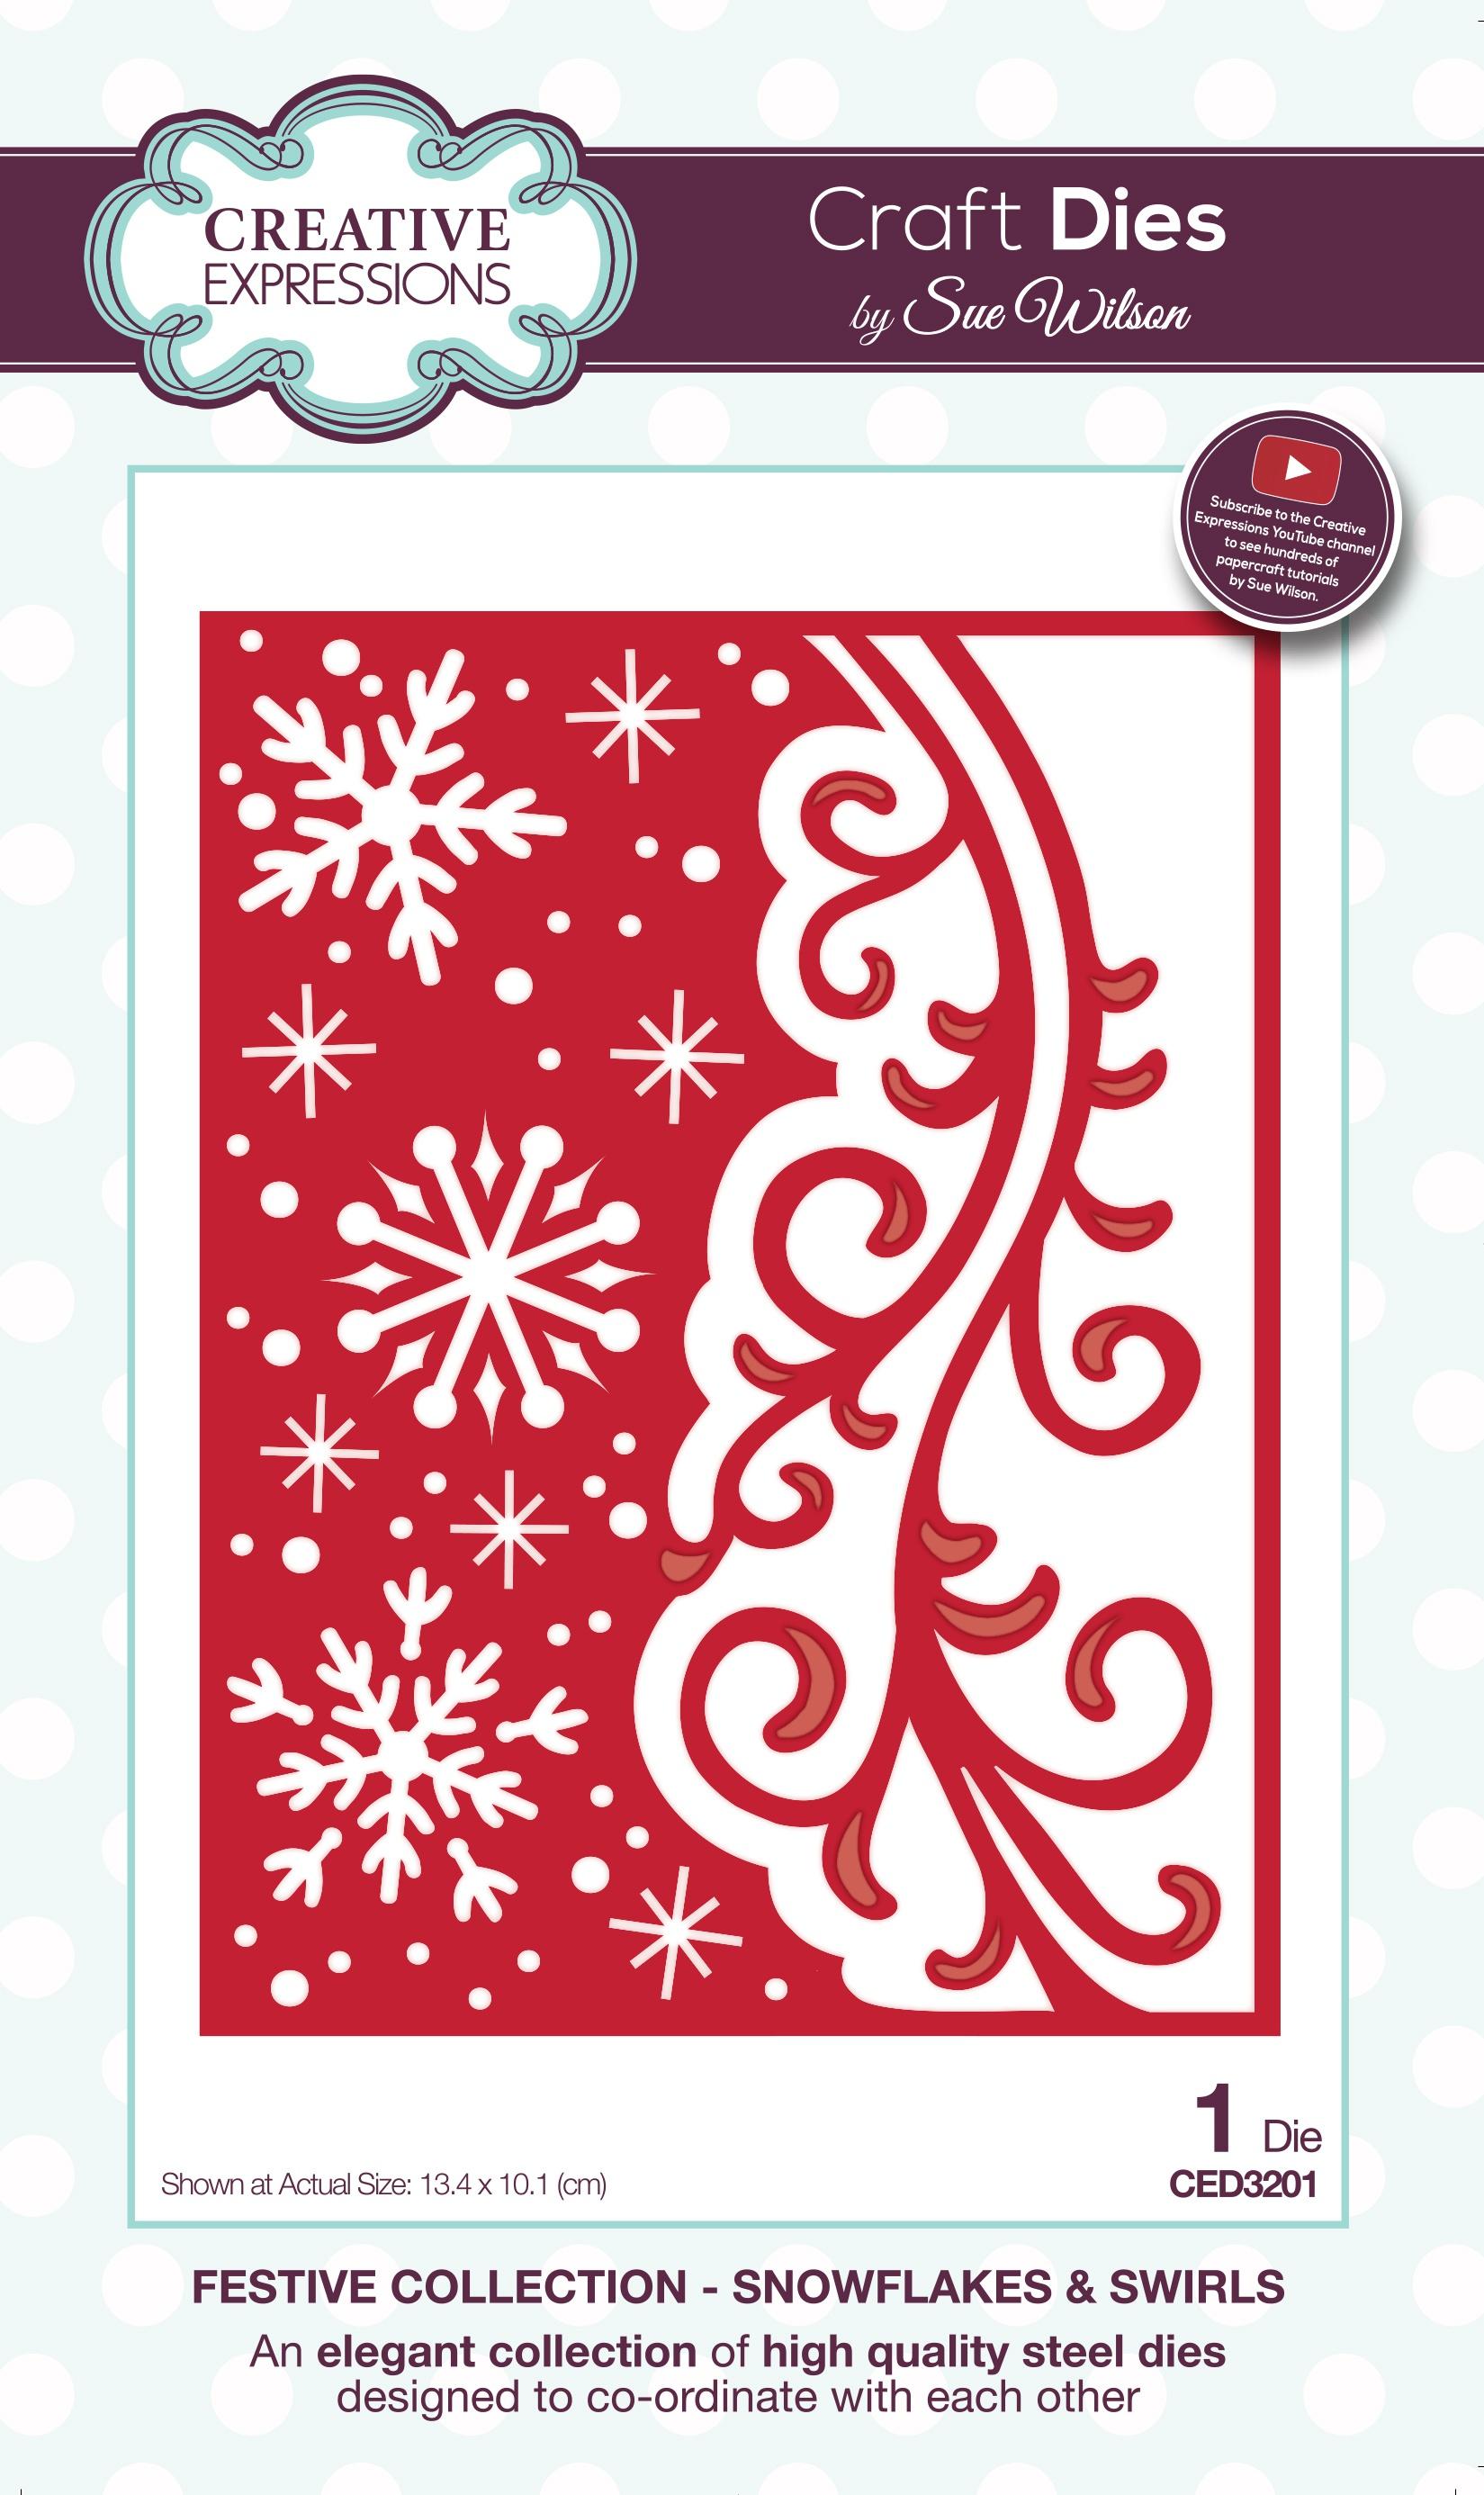 Creative Expressions Craft Dies By Sue Wilson-Snowflakes & Swirls